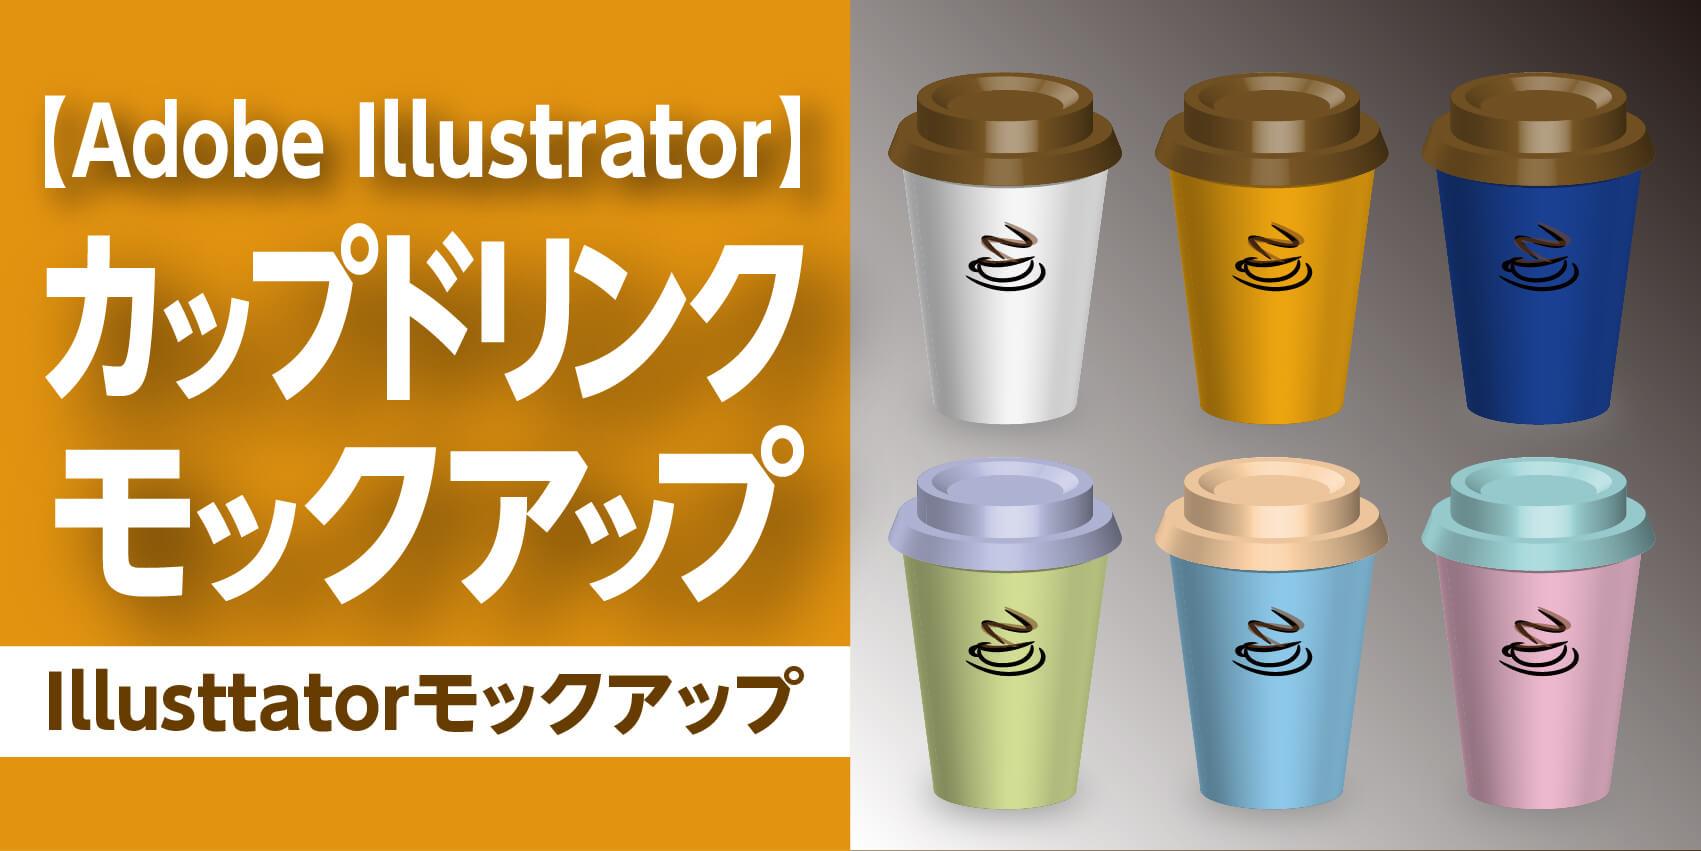 【Illustrator】 時短用モックアップ作成 カップドリンク編